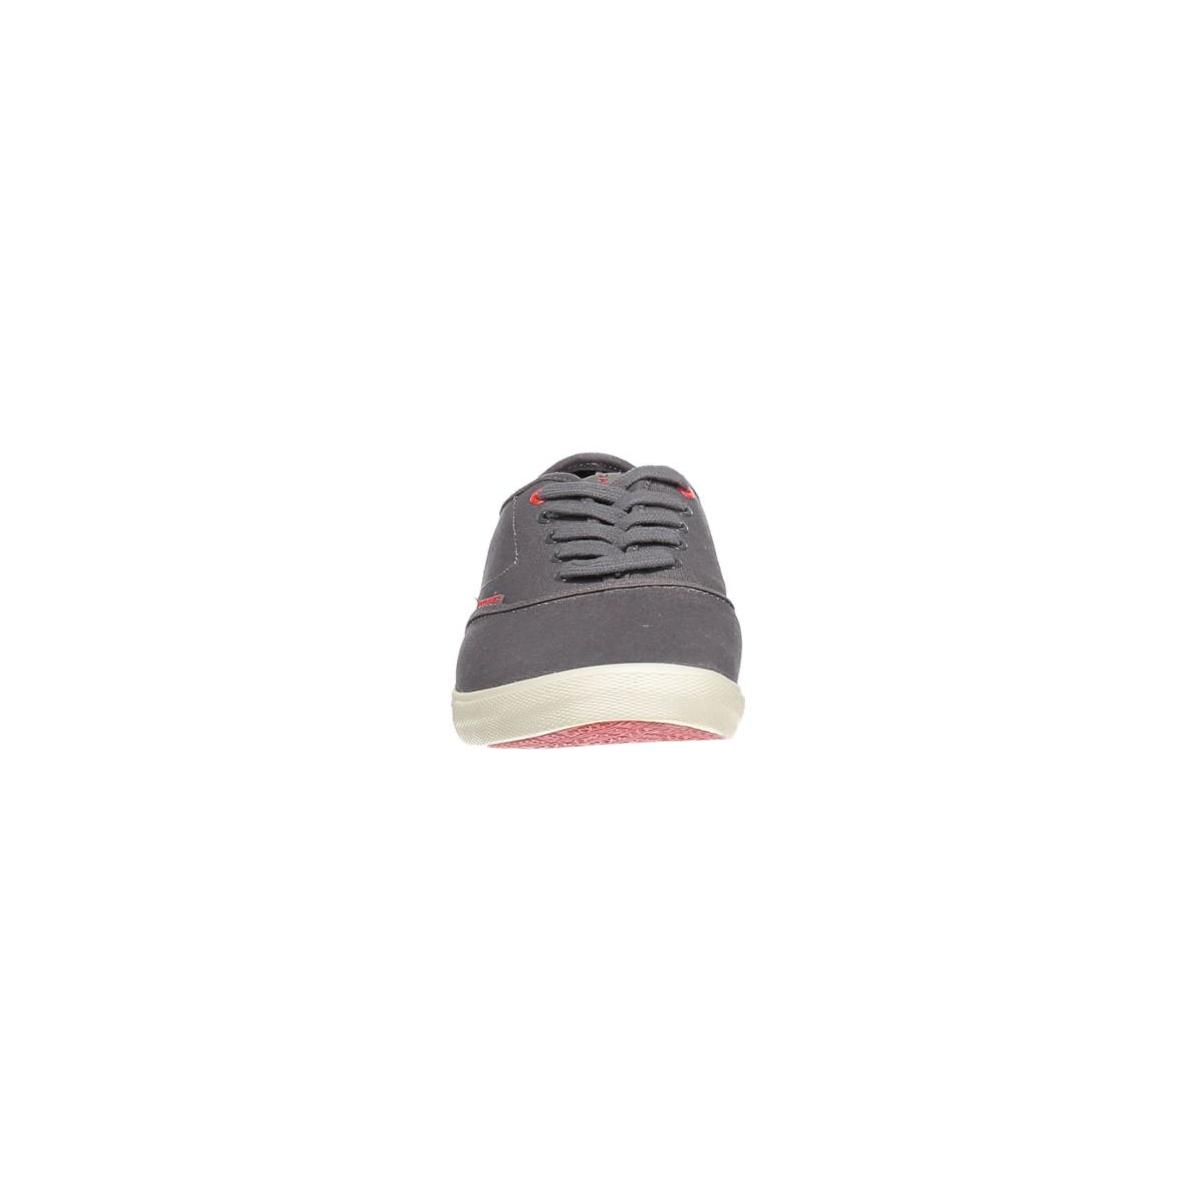 jjspider canvas sneaker 12103537 jack & jones sneaker pewter